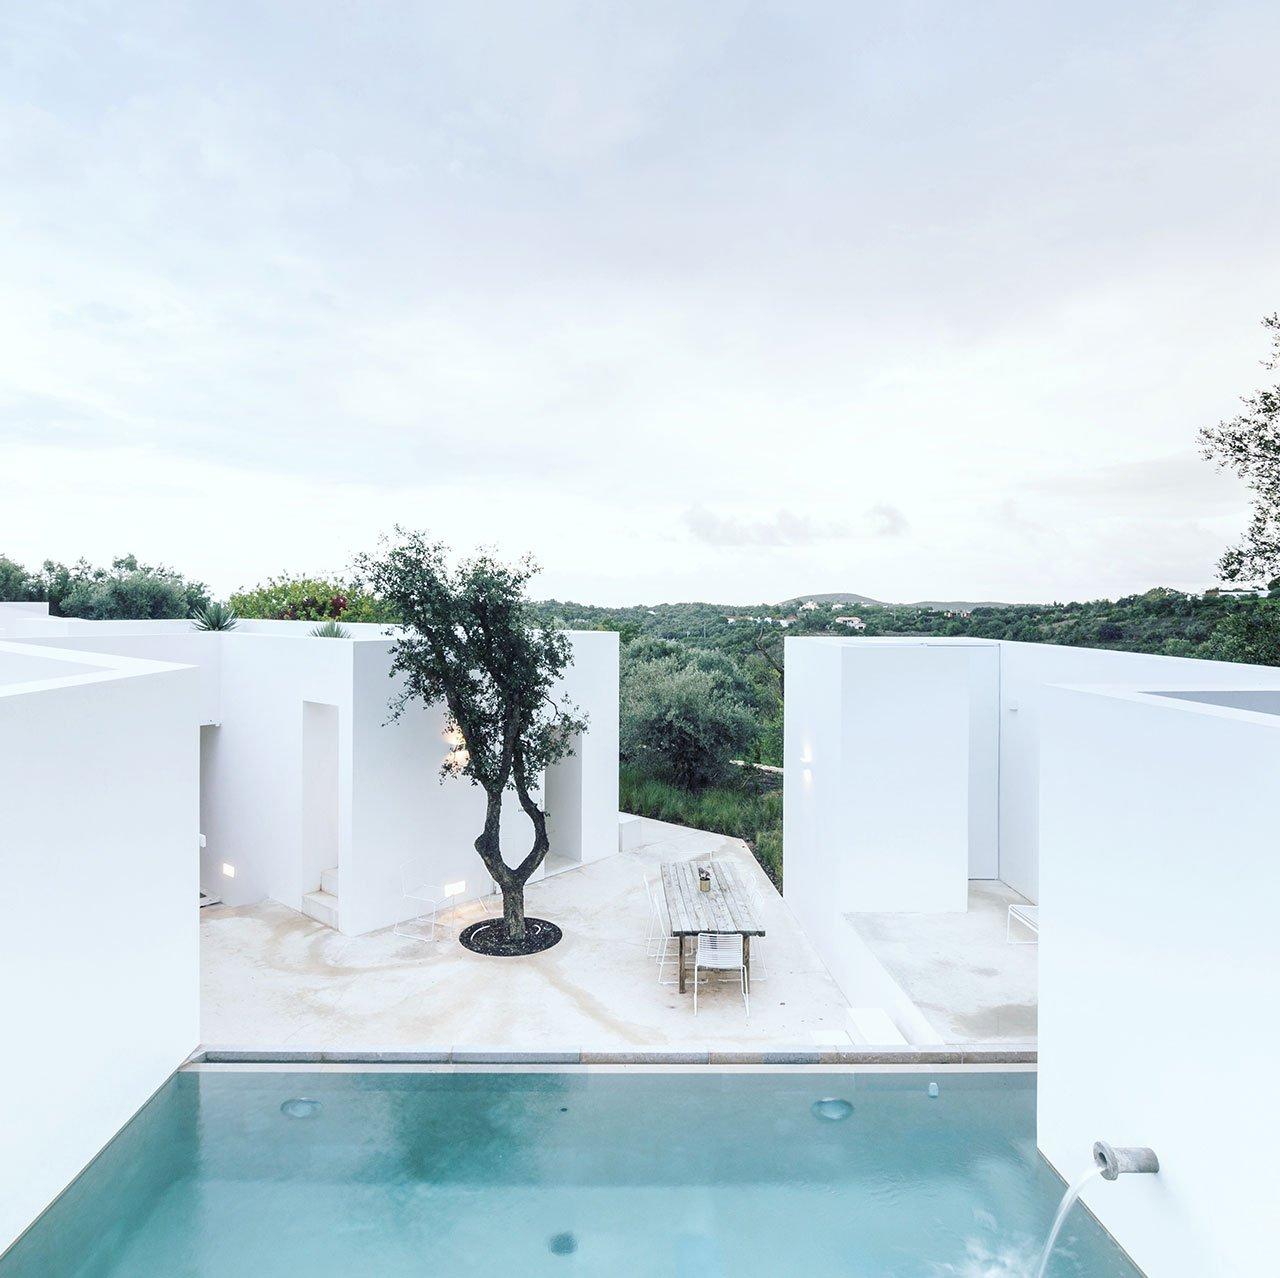 casa-luum-minimalizmus-a-portugal-videken-noko-05.jpg